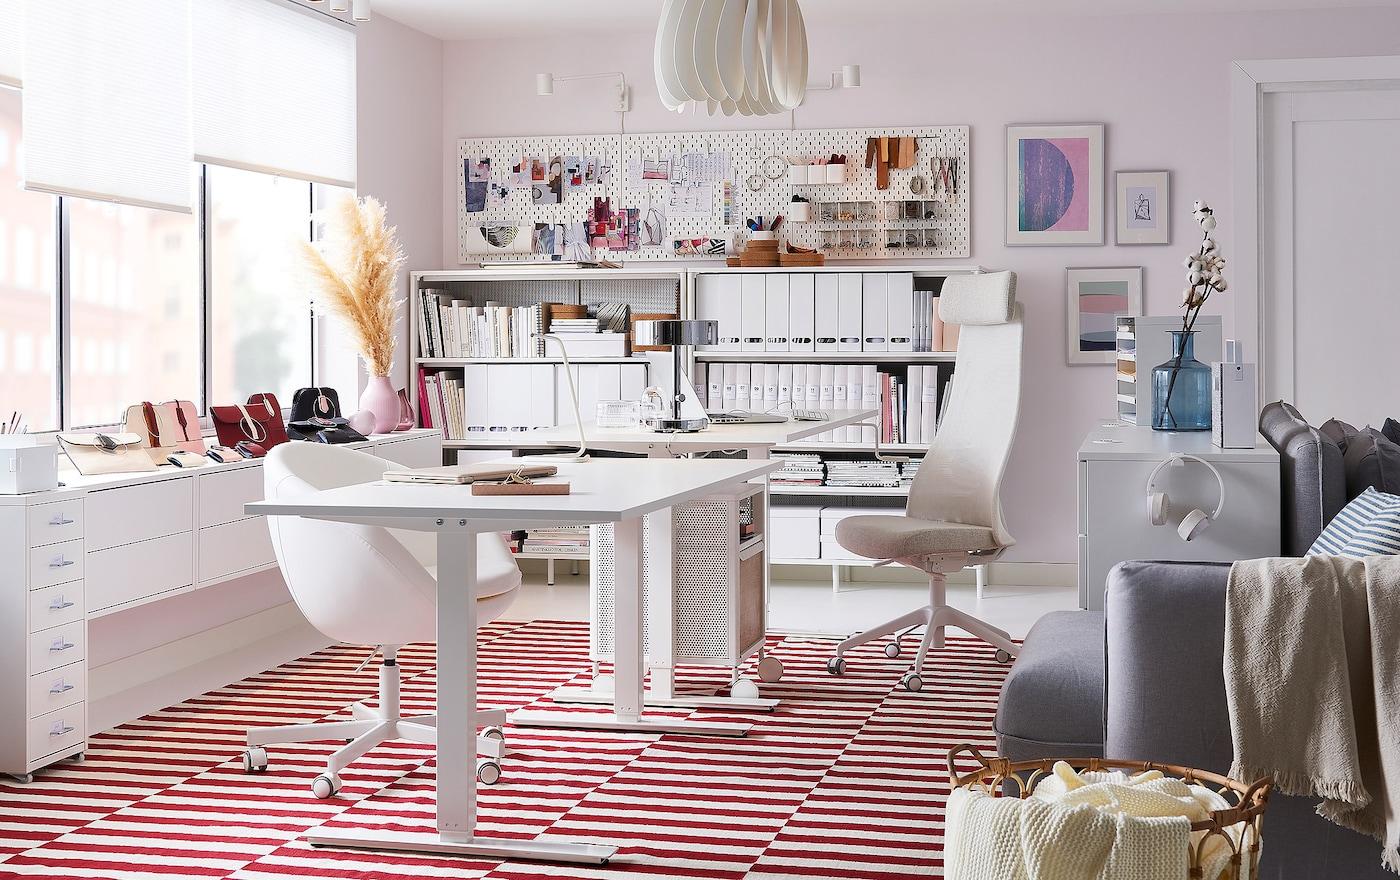 bureau domicile pour travailleur acharn ikea. Black Bedroom Furniture Sets. Home Design Ideas